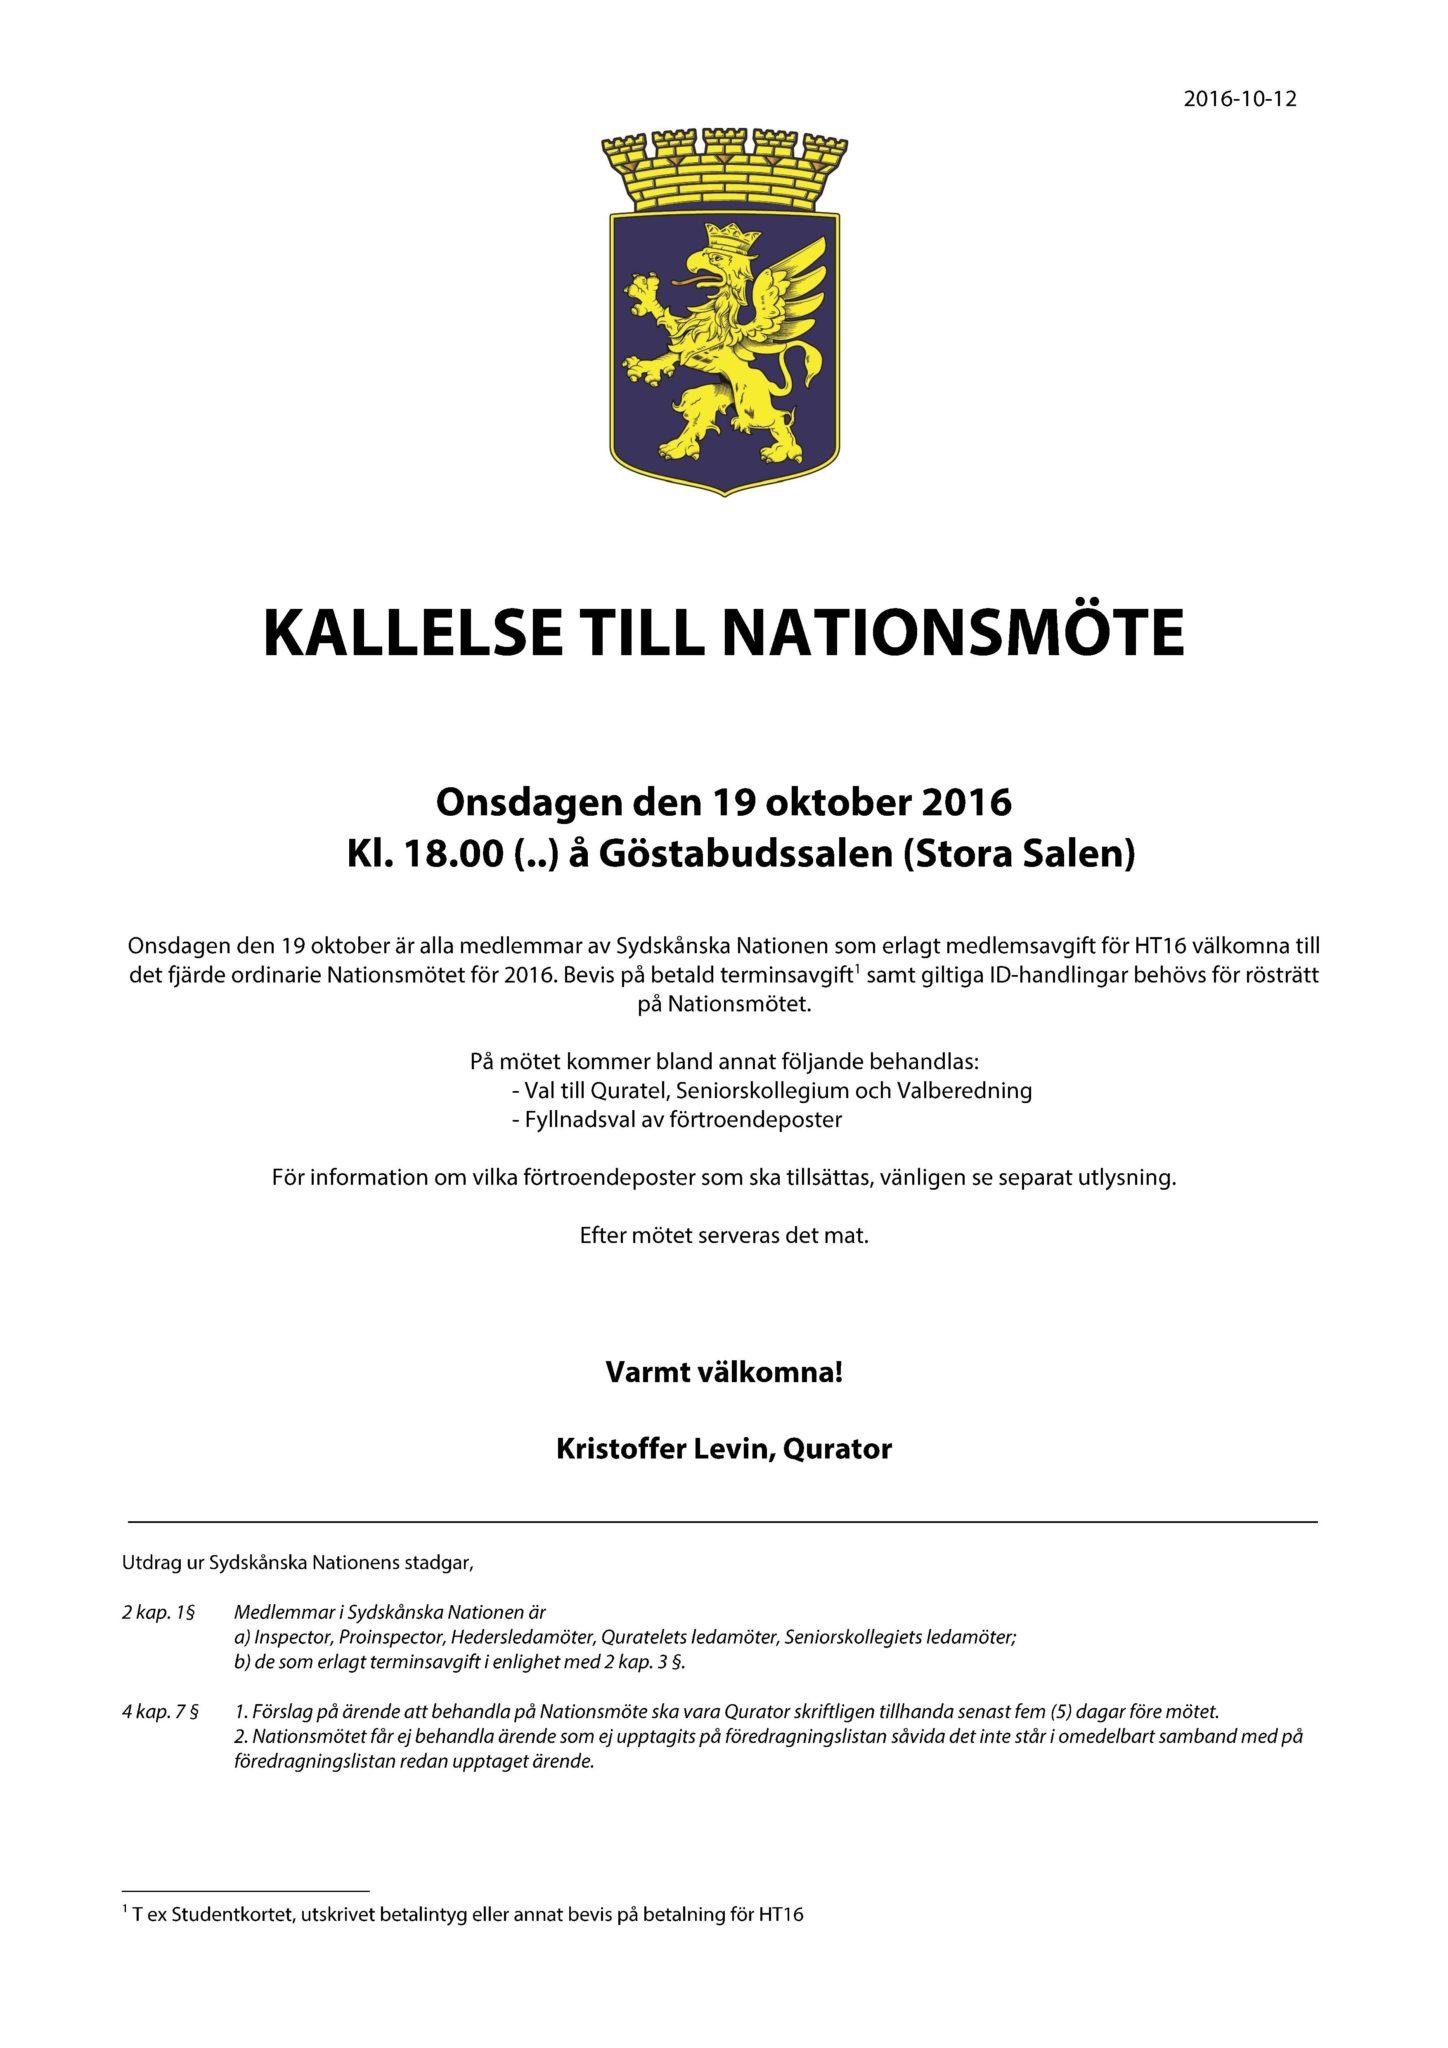 kallelse-till-nationsmote-2016-10-19